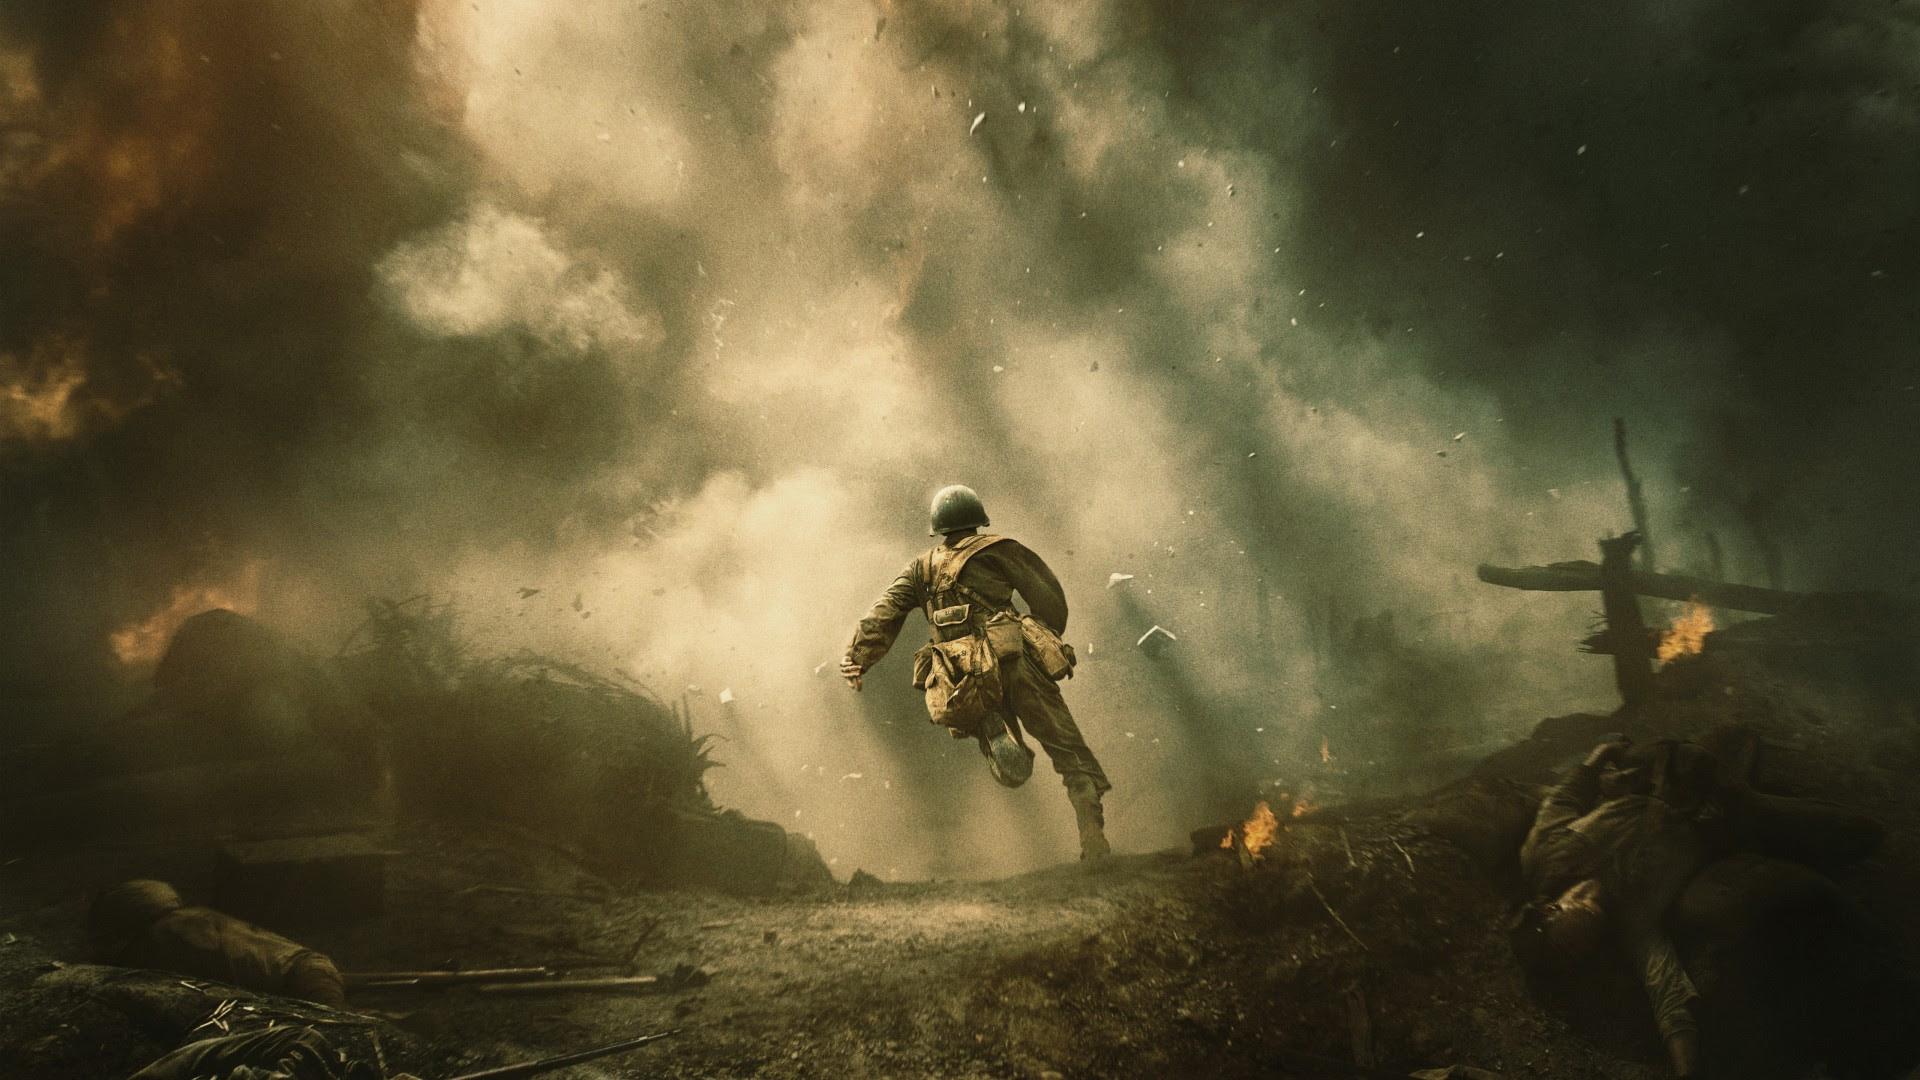 Hacksaw Ridge 2016 Movie Wallpapers  HD Wallpapers  ID 19006